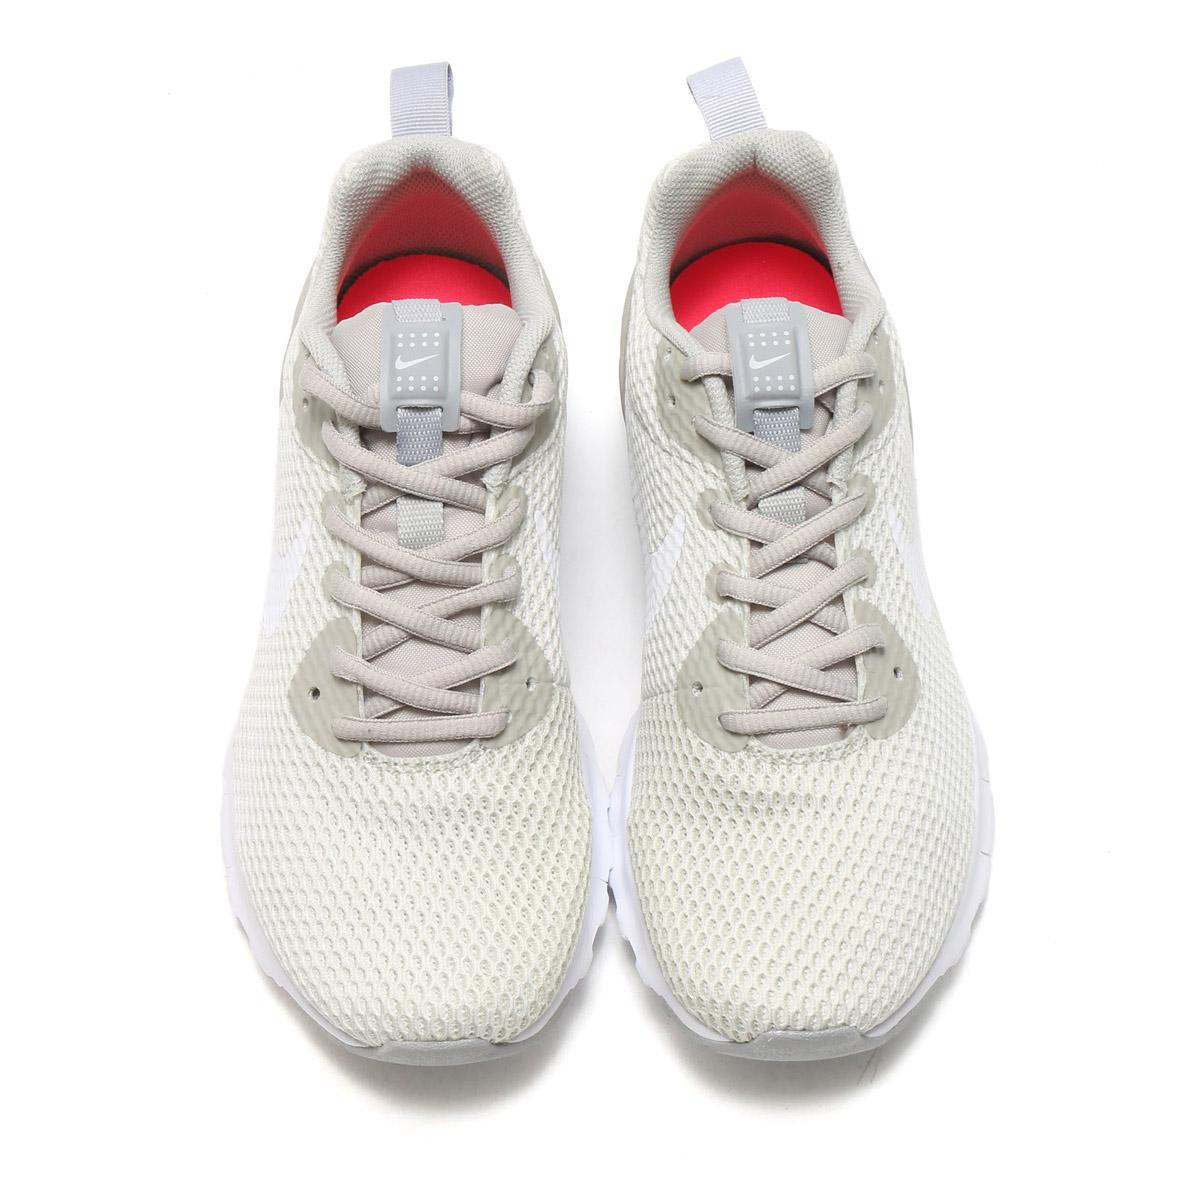 NIKE WMNS AIR MAX MOTION LW SE (Nike women Air Max motion LW SE) (PALE GREY/WHITE-WOLF GREY-RACER PINK) 17SU-I